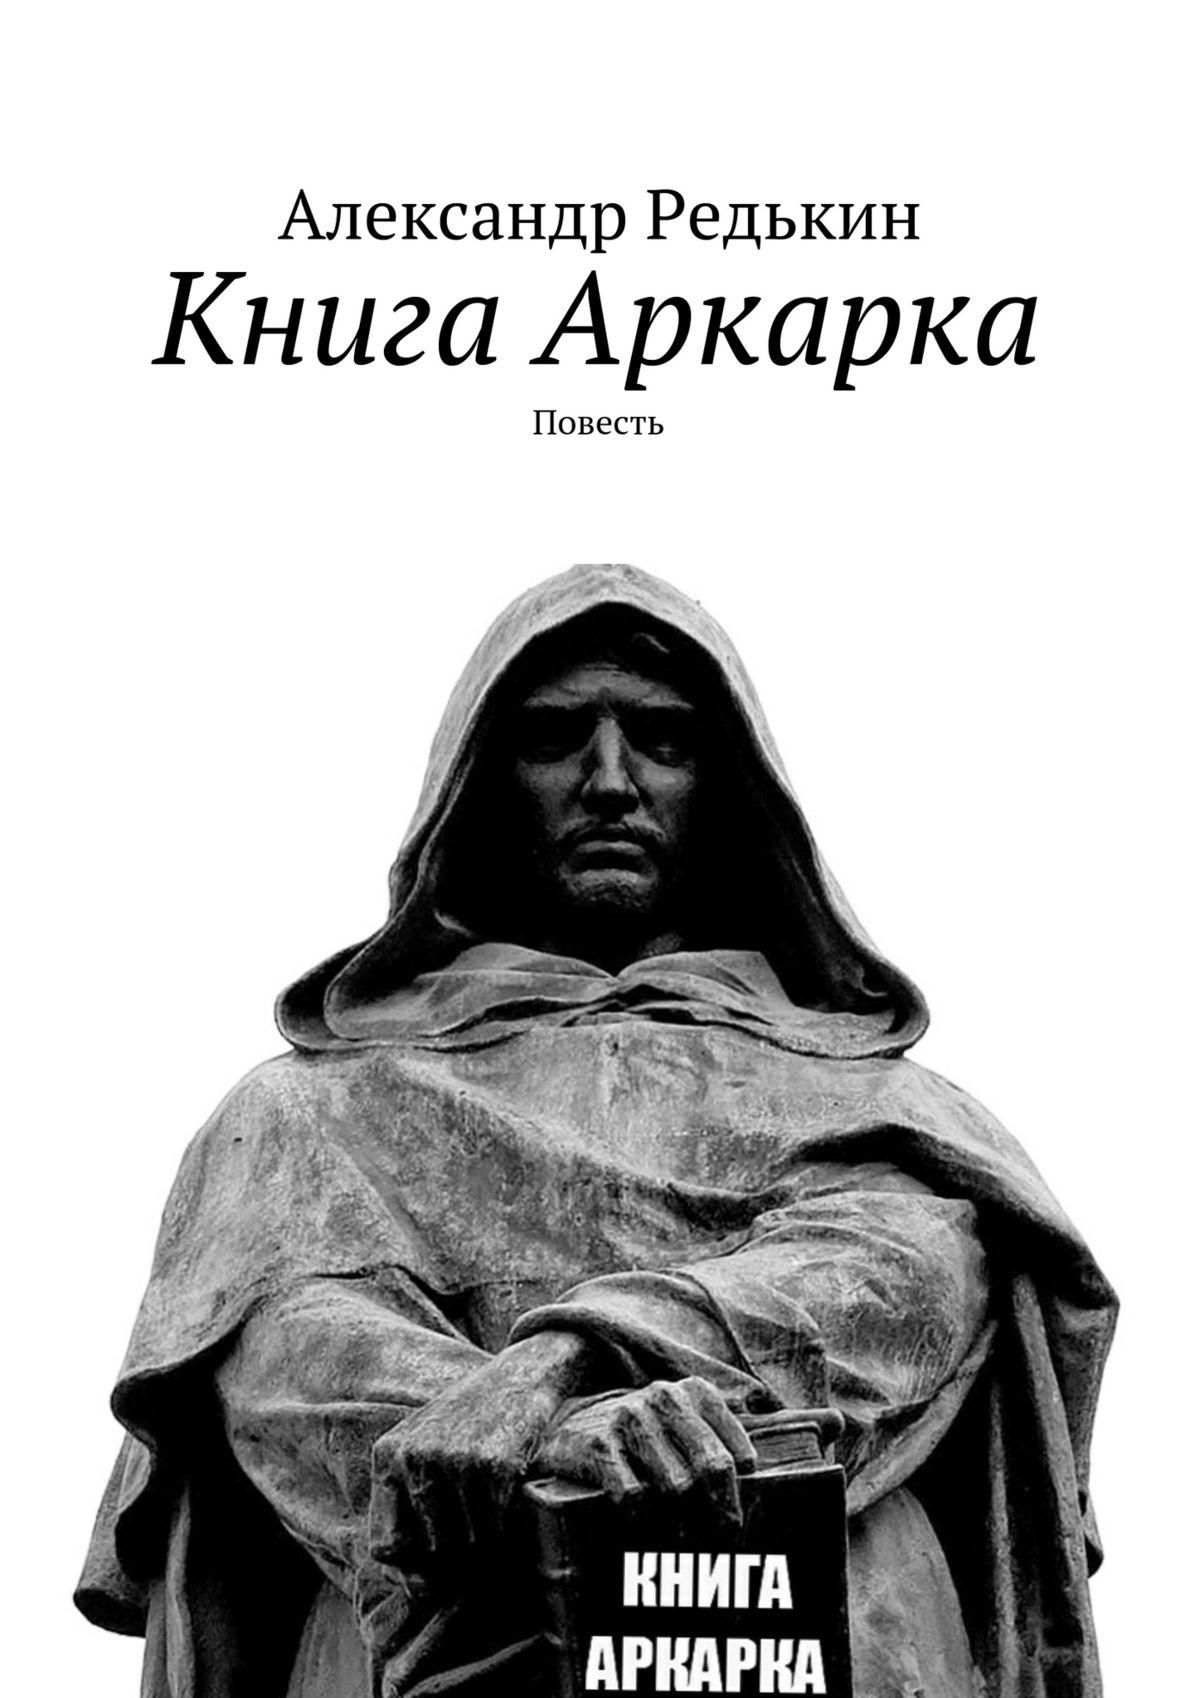 Александр Валерьевич Редькин Книга Аркарка. Повесть александр леонидович редькин 7